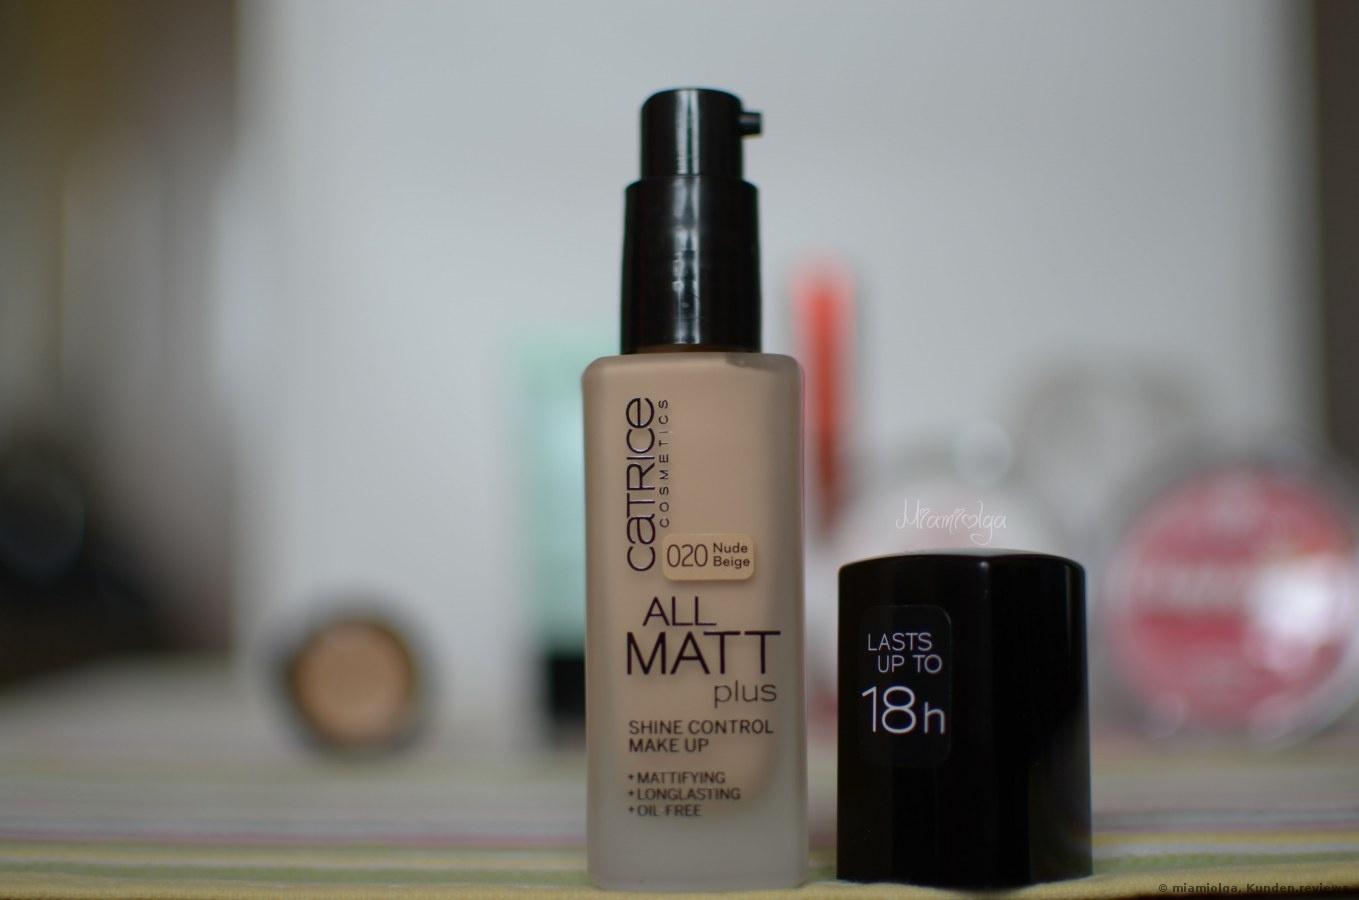 Catrice Foundation All Matt Plus Shine Control Make Up